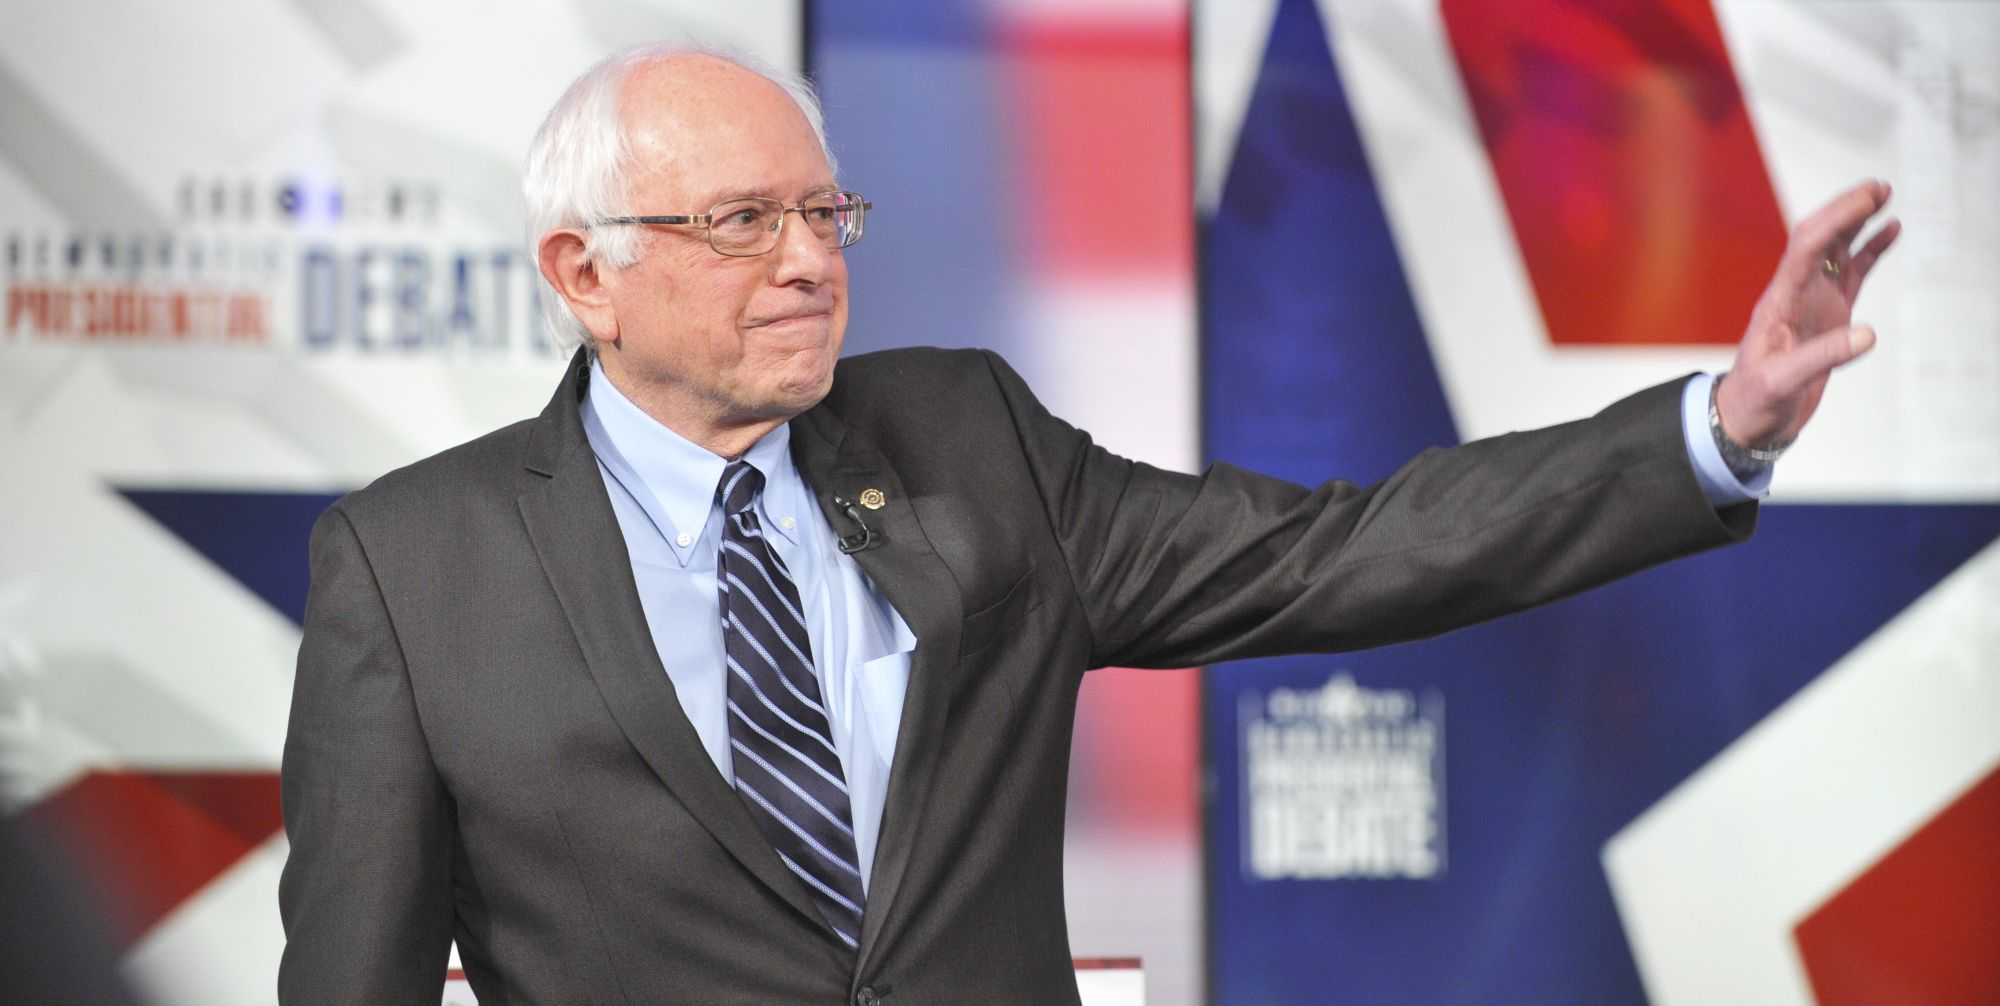 CBS News Democratic Presidential Debate